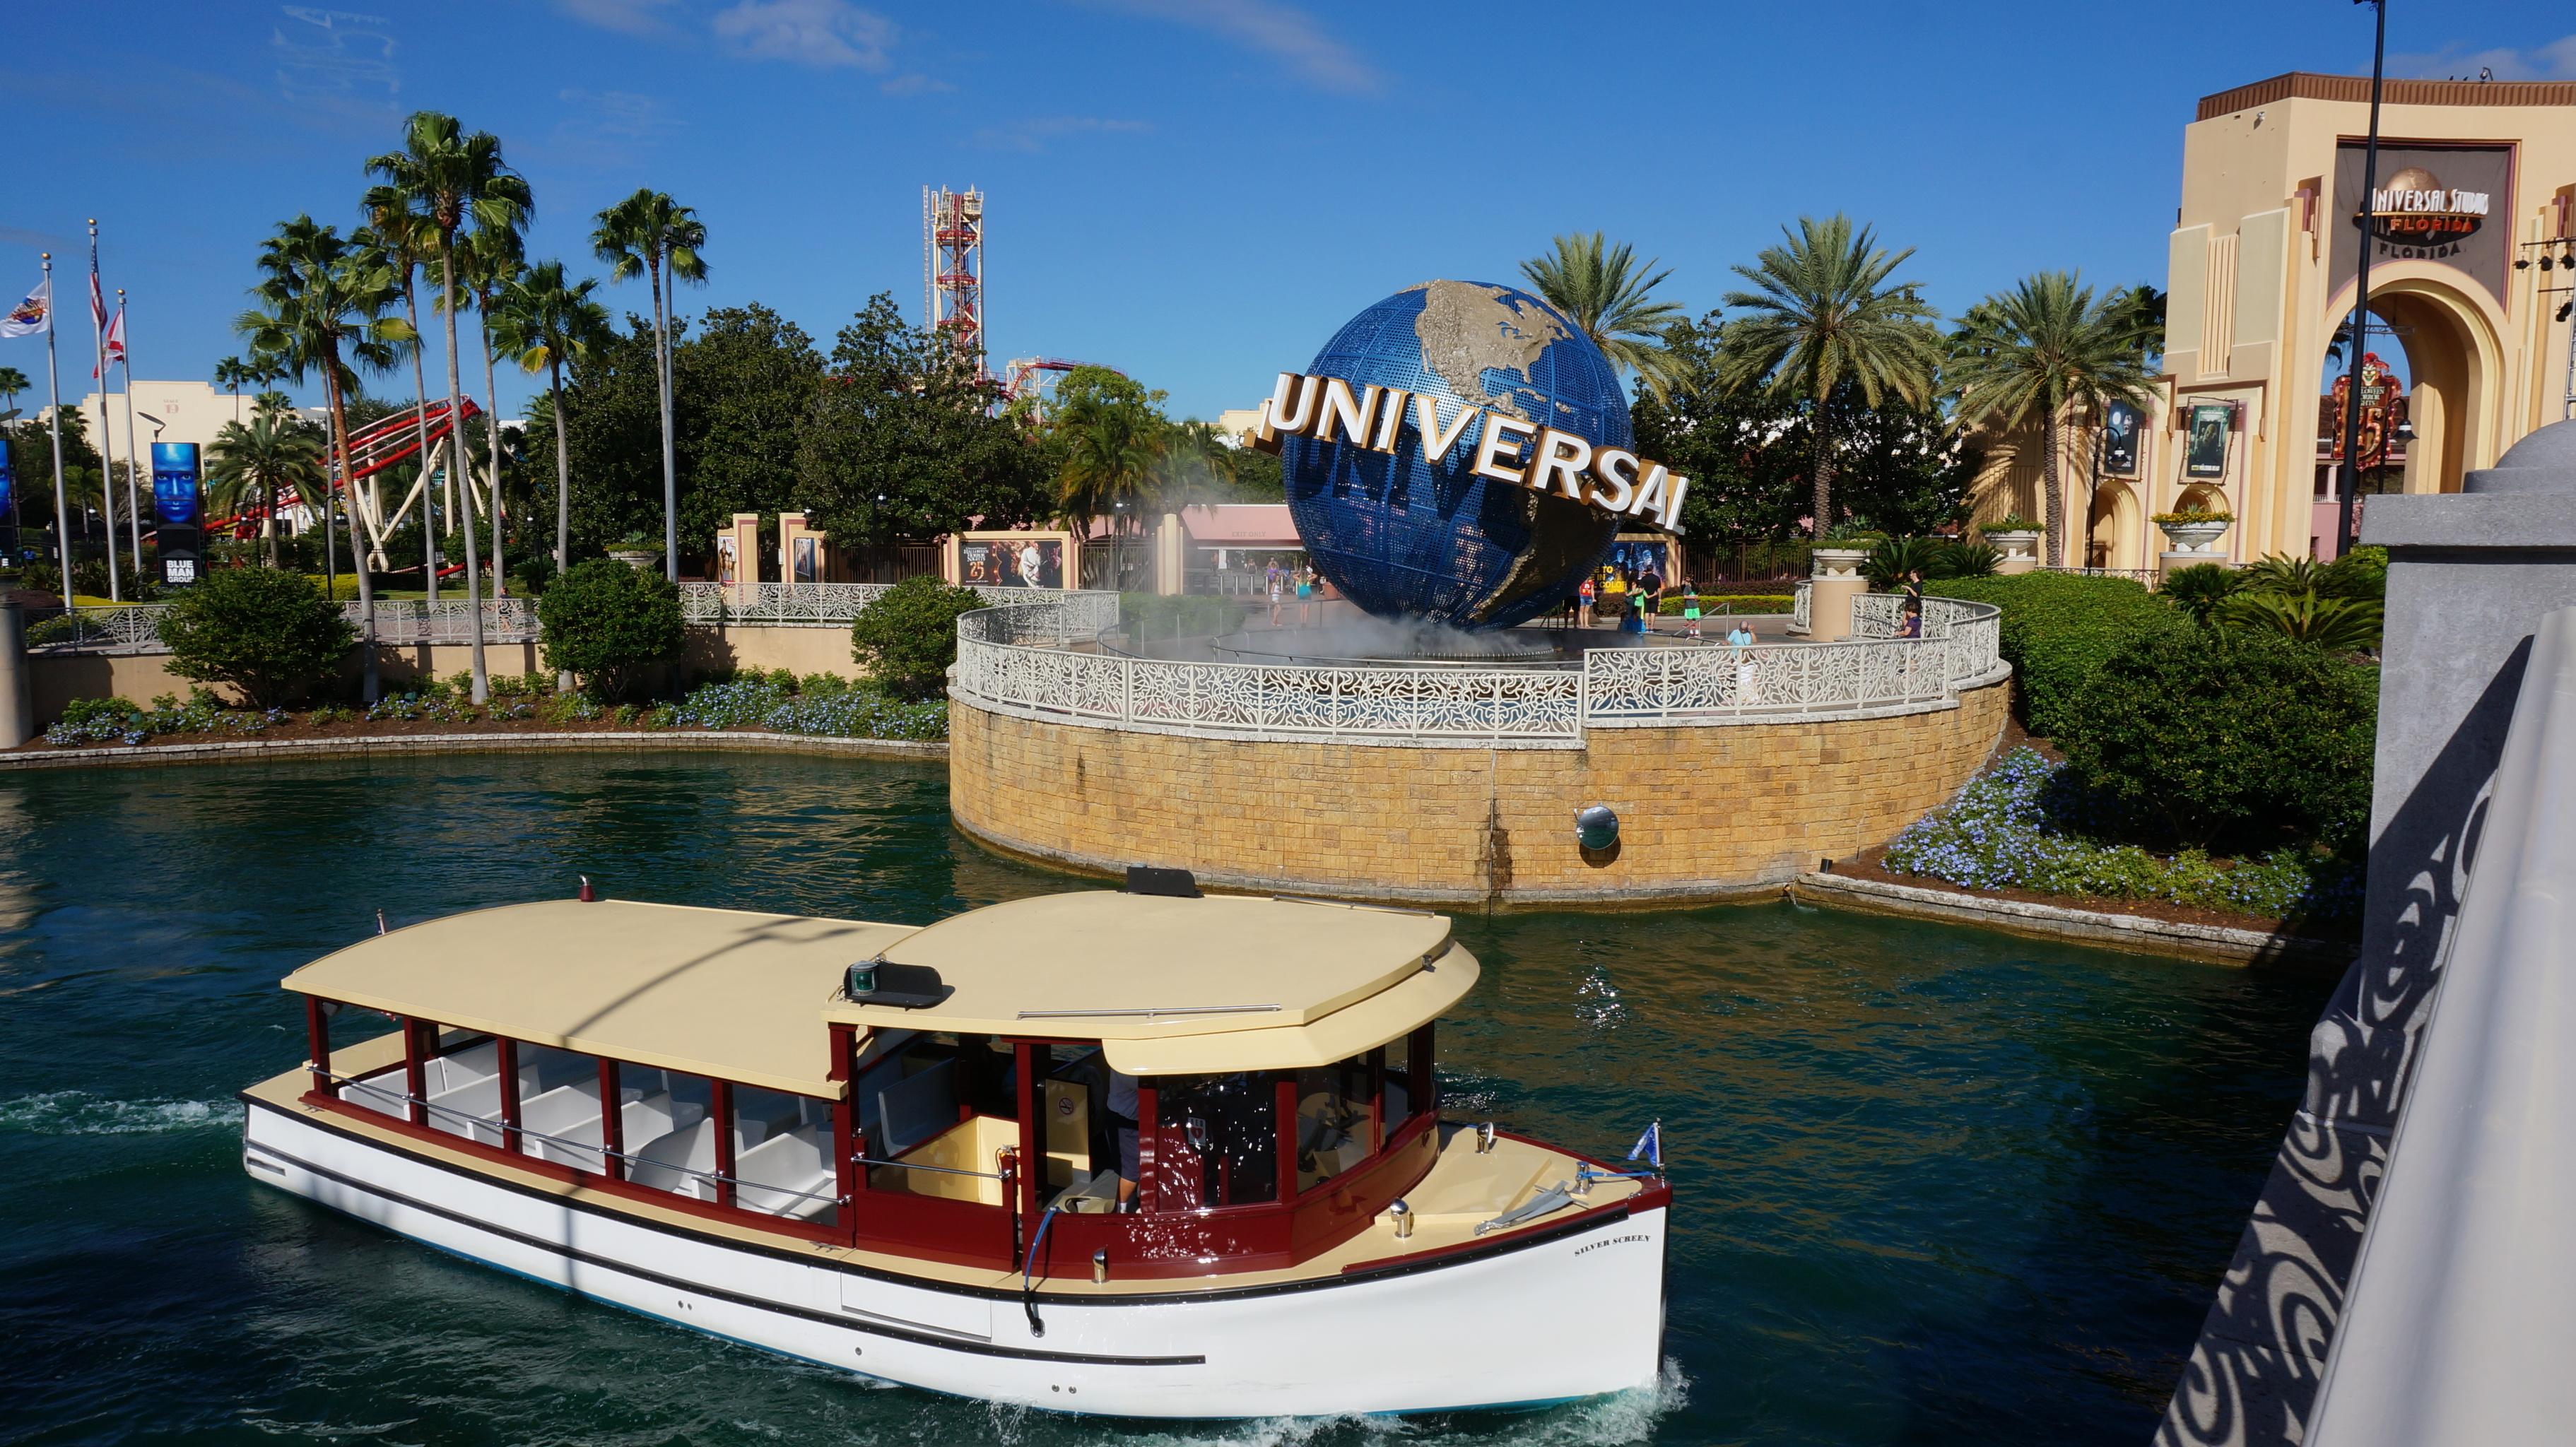 Universal Orlando October 2015 trip report